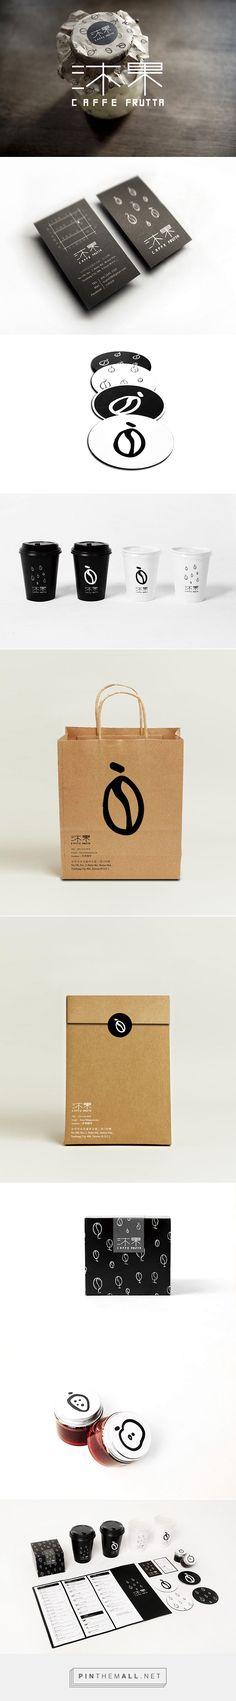 Caffe Frutta Branding by Erica Su